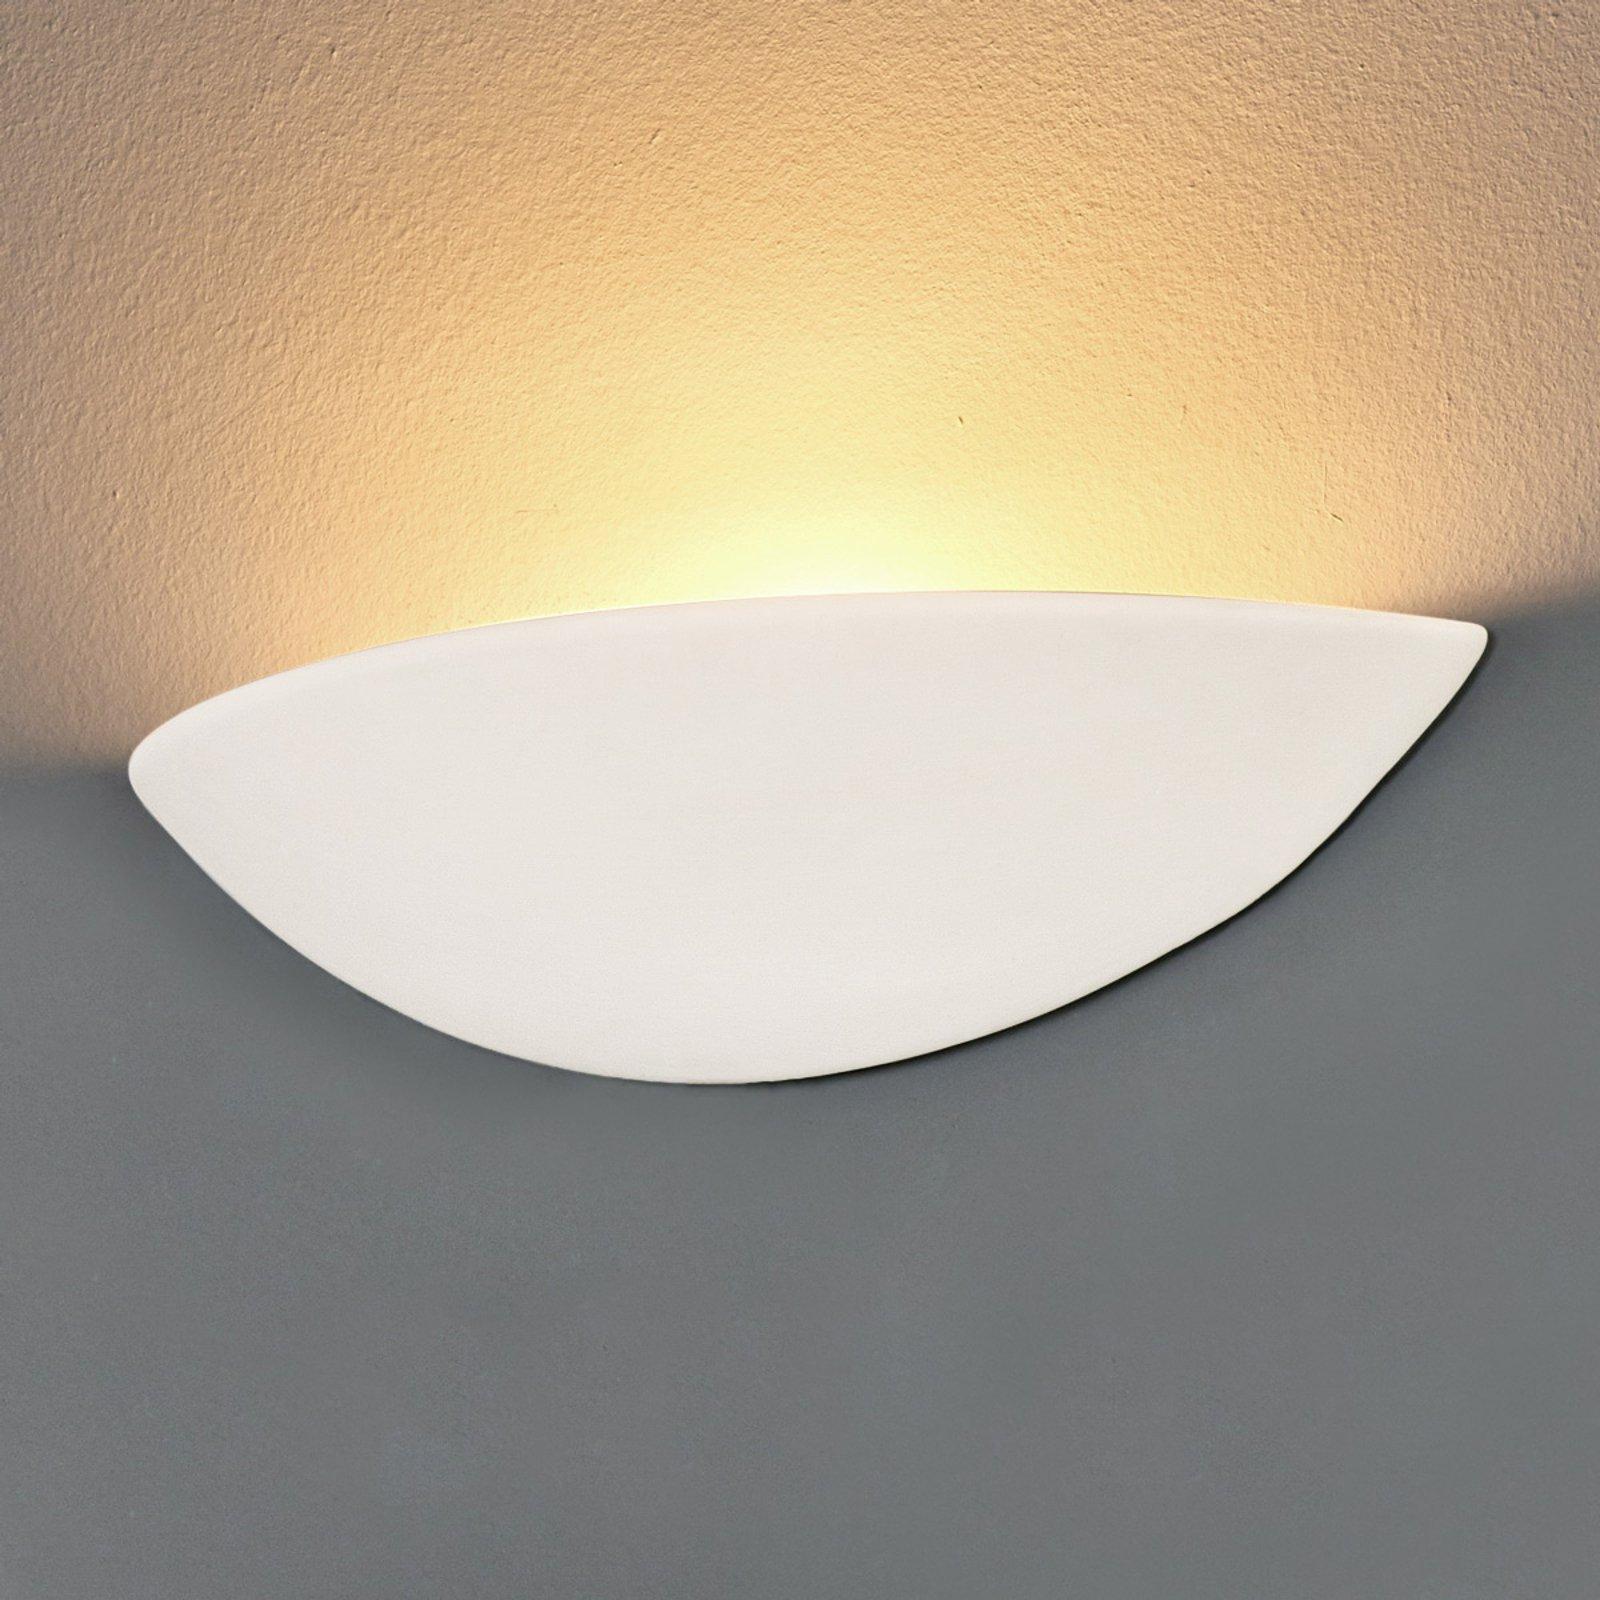 LED Gips-vegglampe PALE, kan males